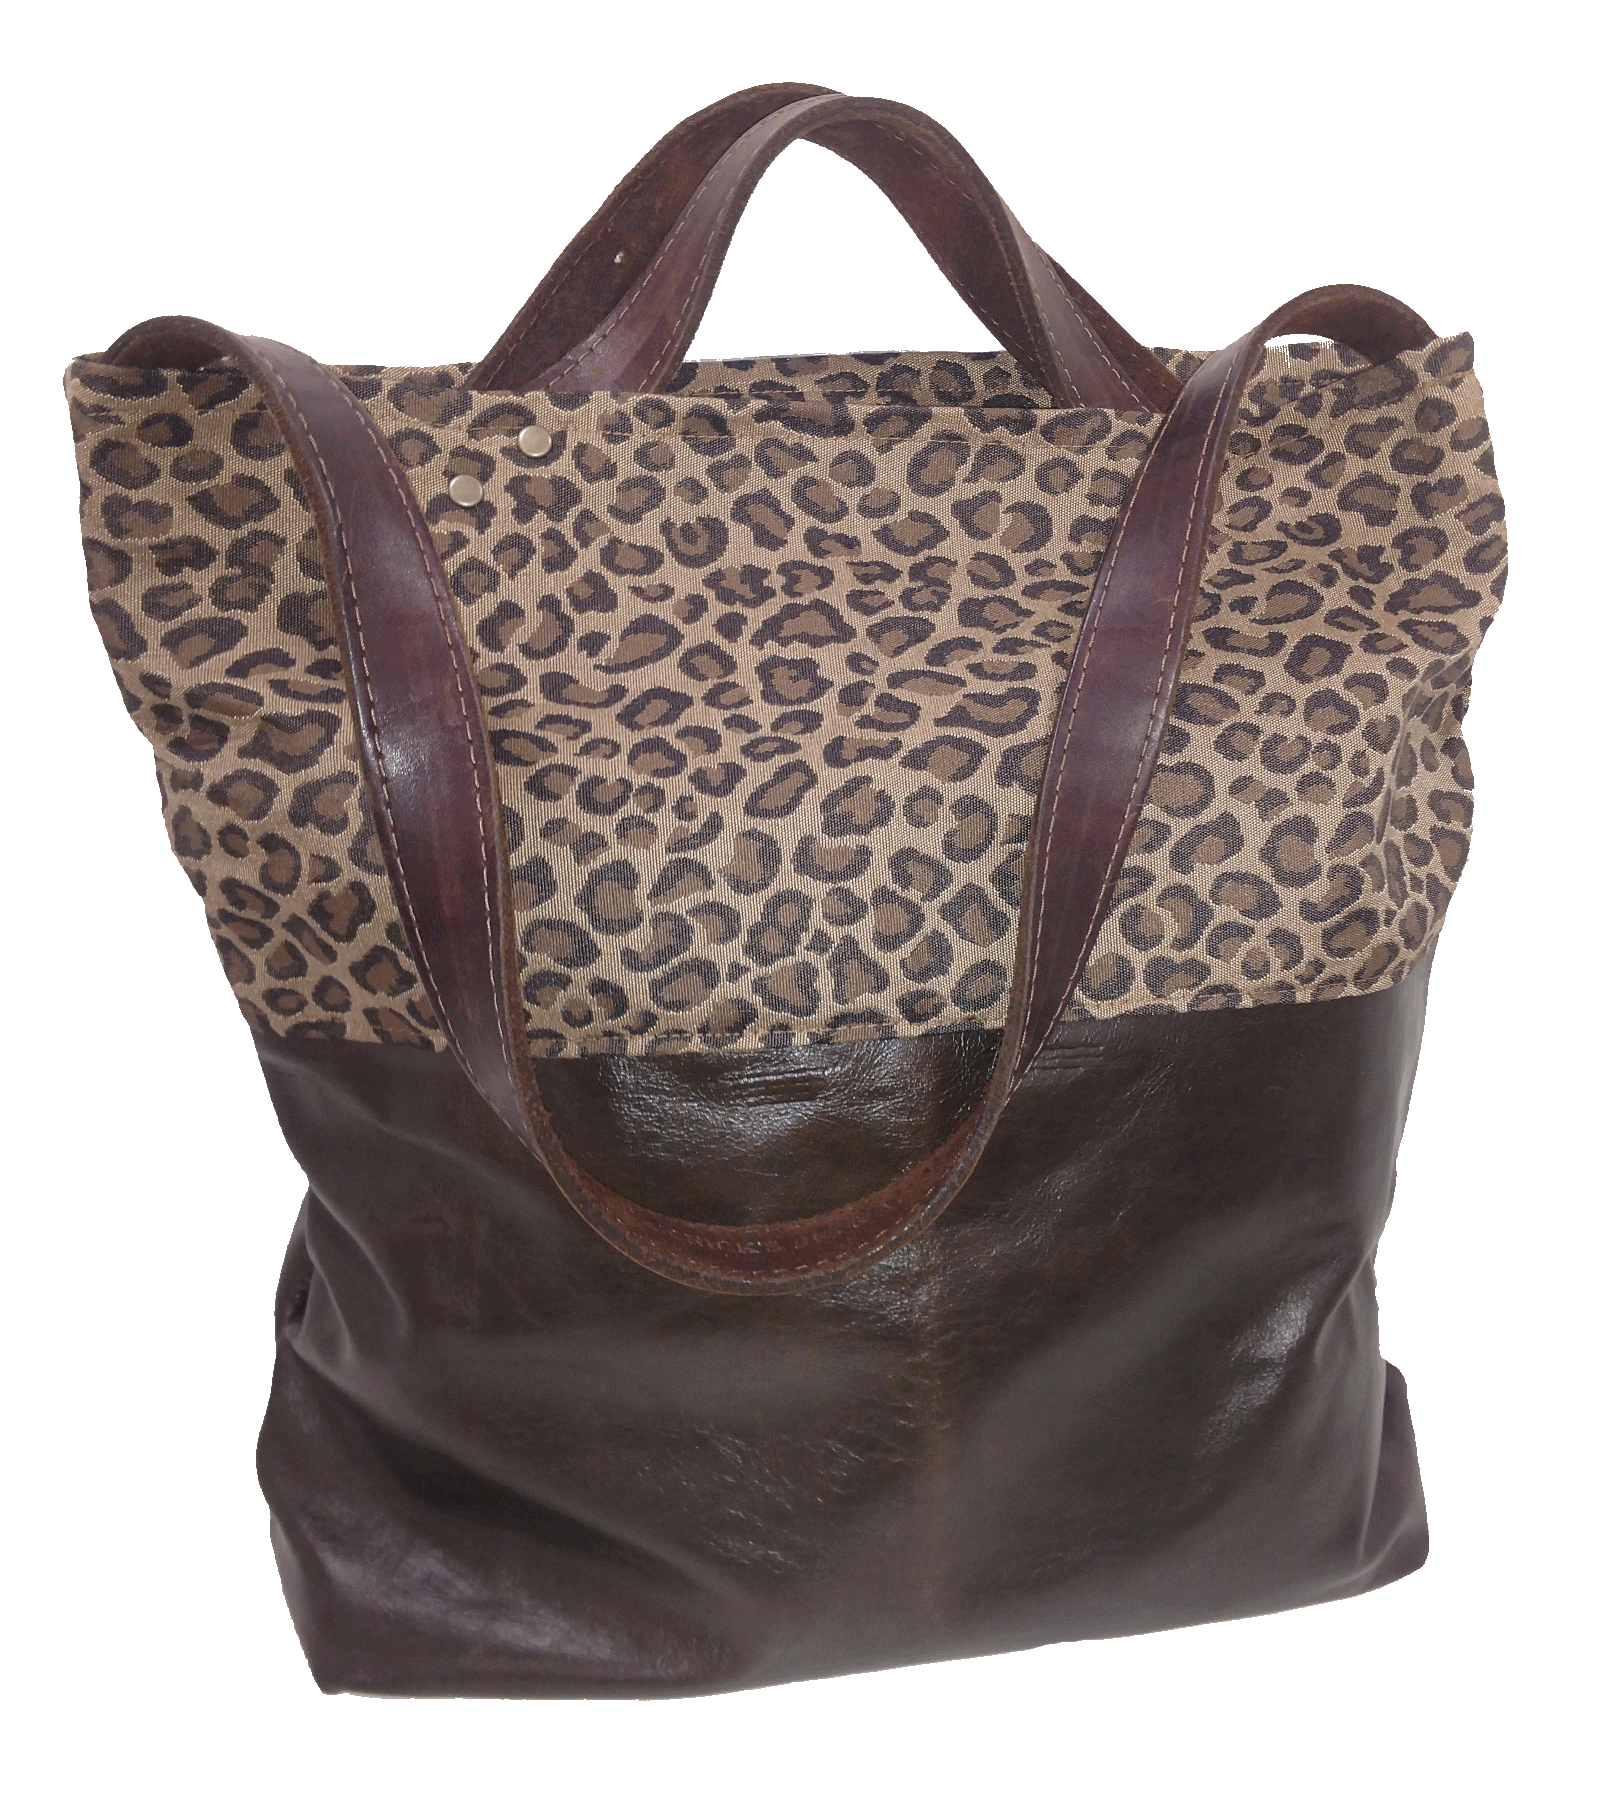 Grumpy Bags Leopard Print Medium Tote 2018-2.png